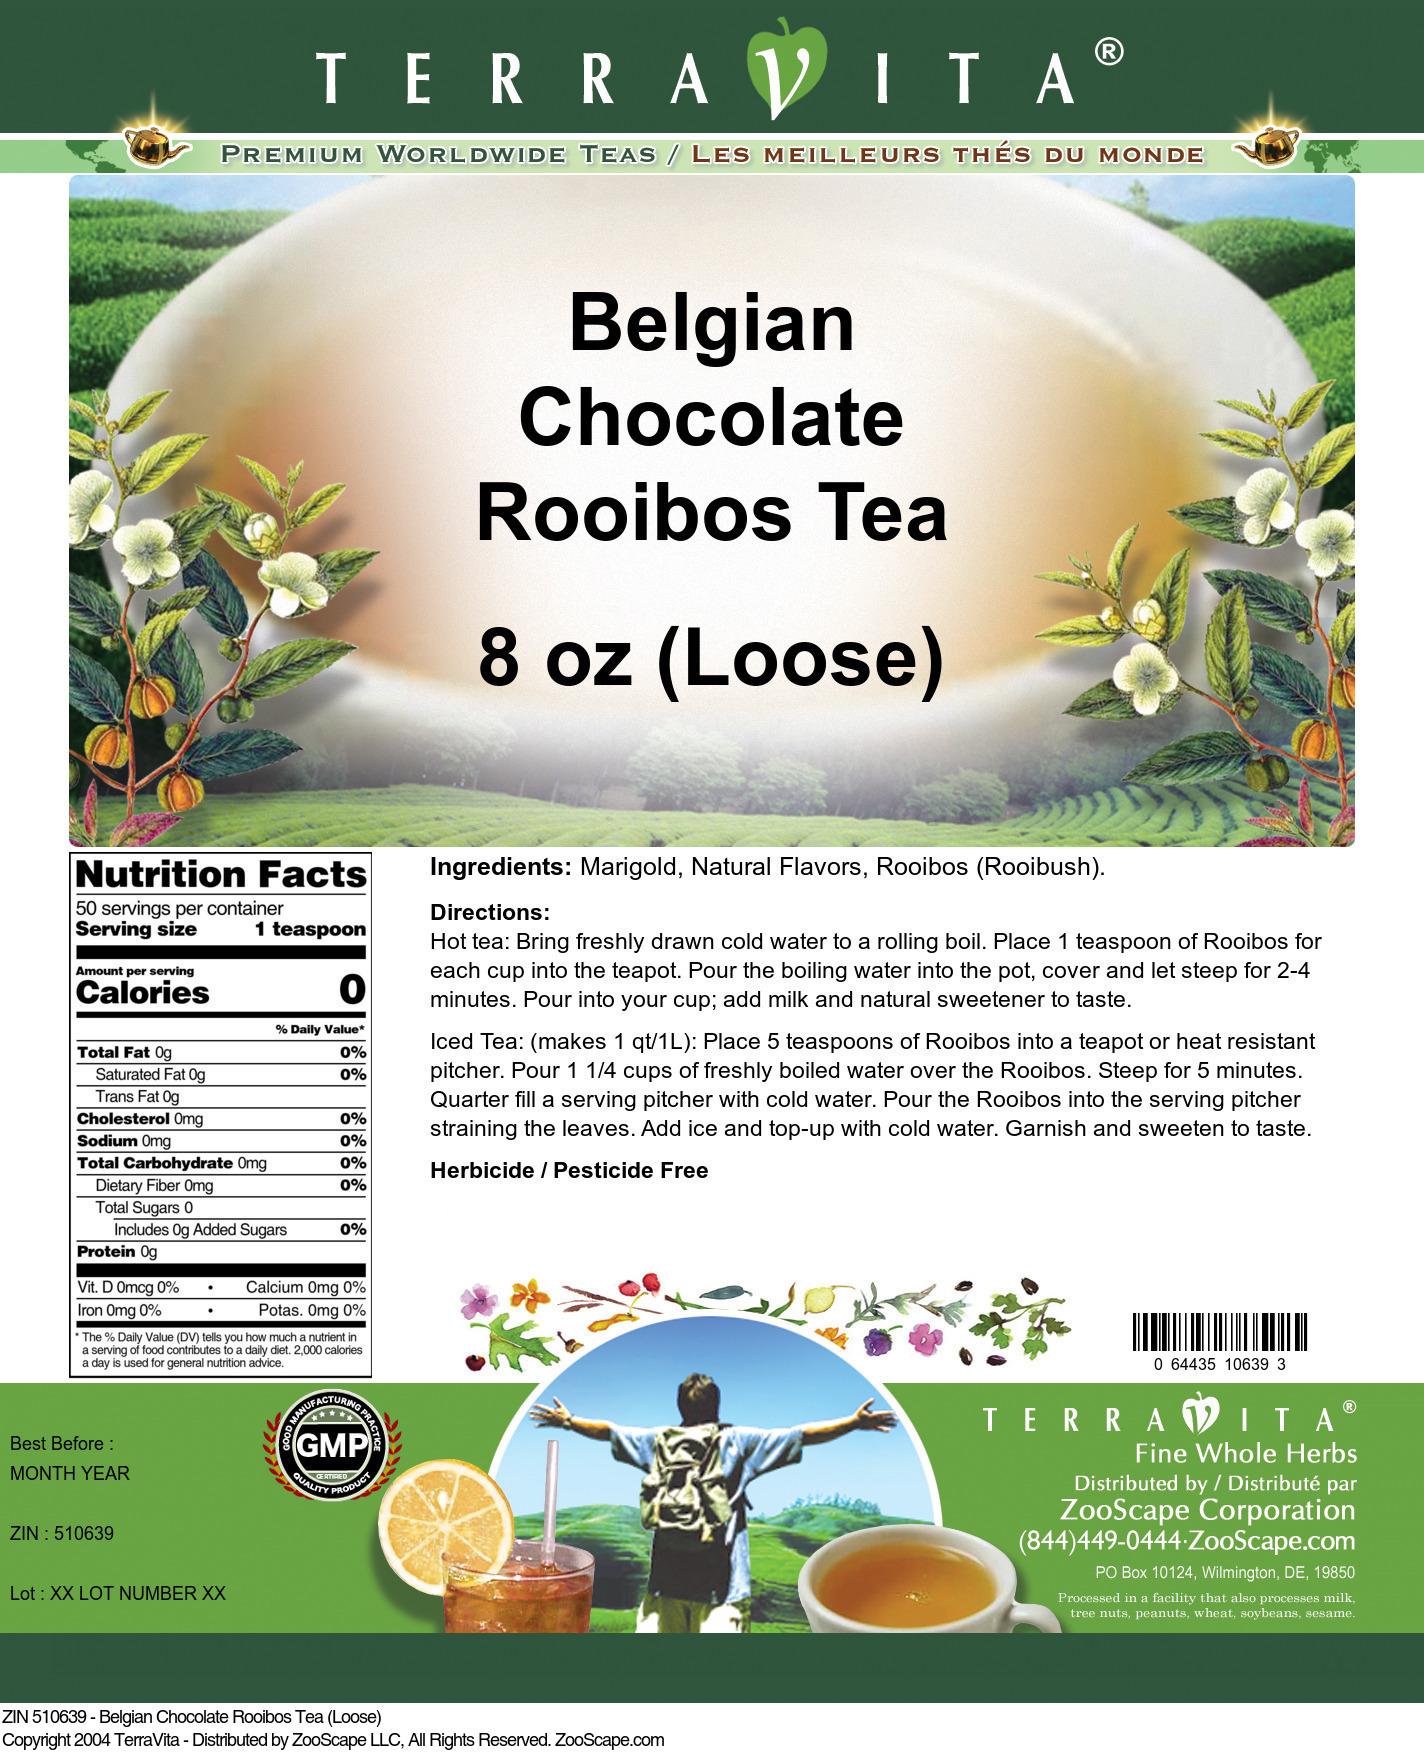 Belgian Chocolate Rooibos Tea (Loose) - Label